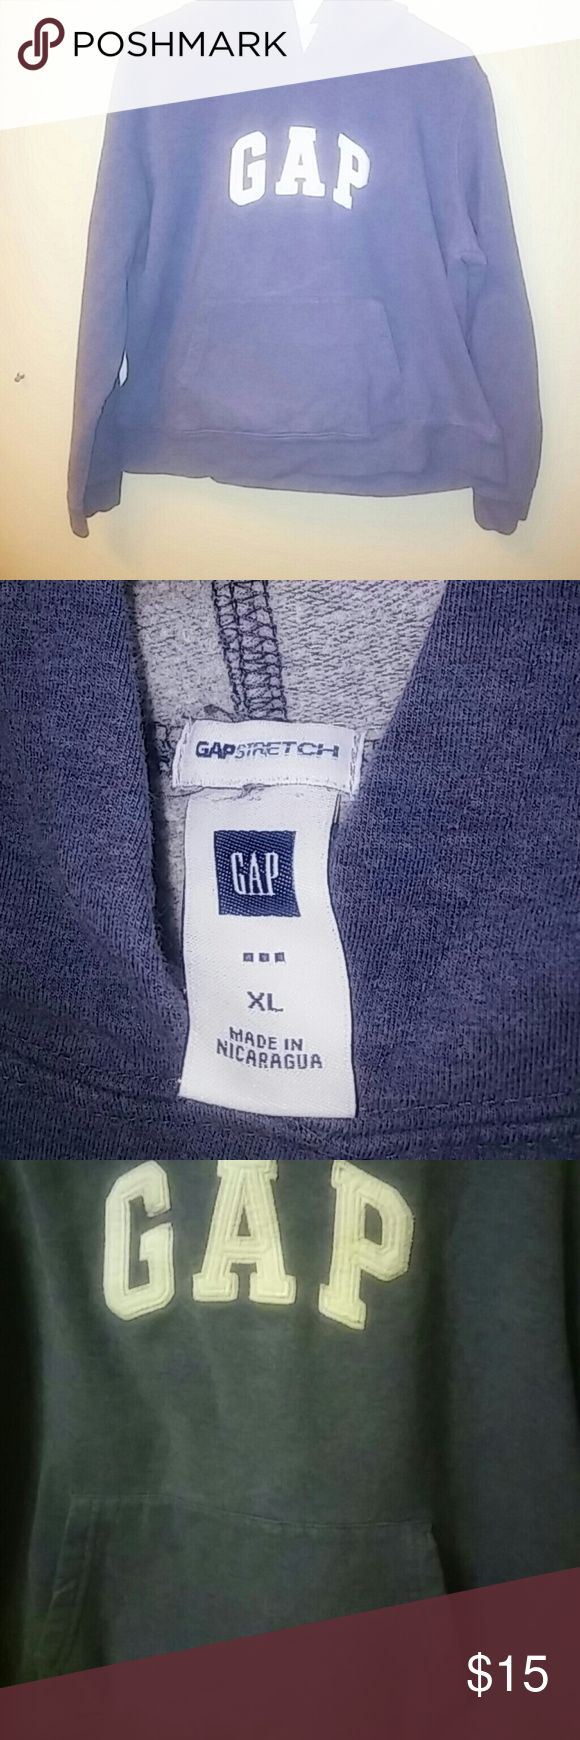 GAP ladies hoodie XL GAP ladies hoodie XL in perfect shape denim blue in color very warm. Clean no stains and laundered $$ offers available GAP Tops Sweatshirts & Hoodies